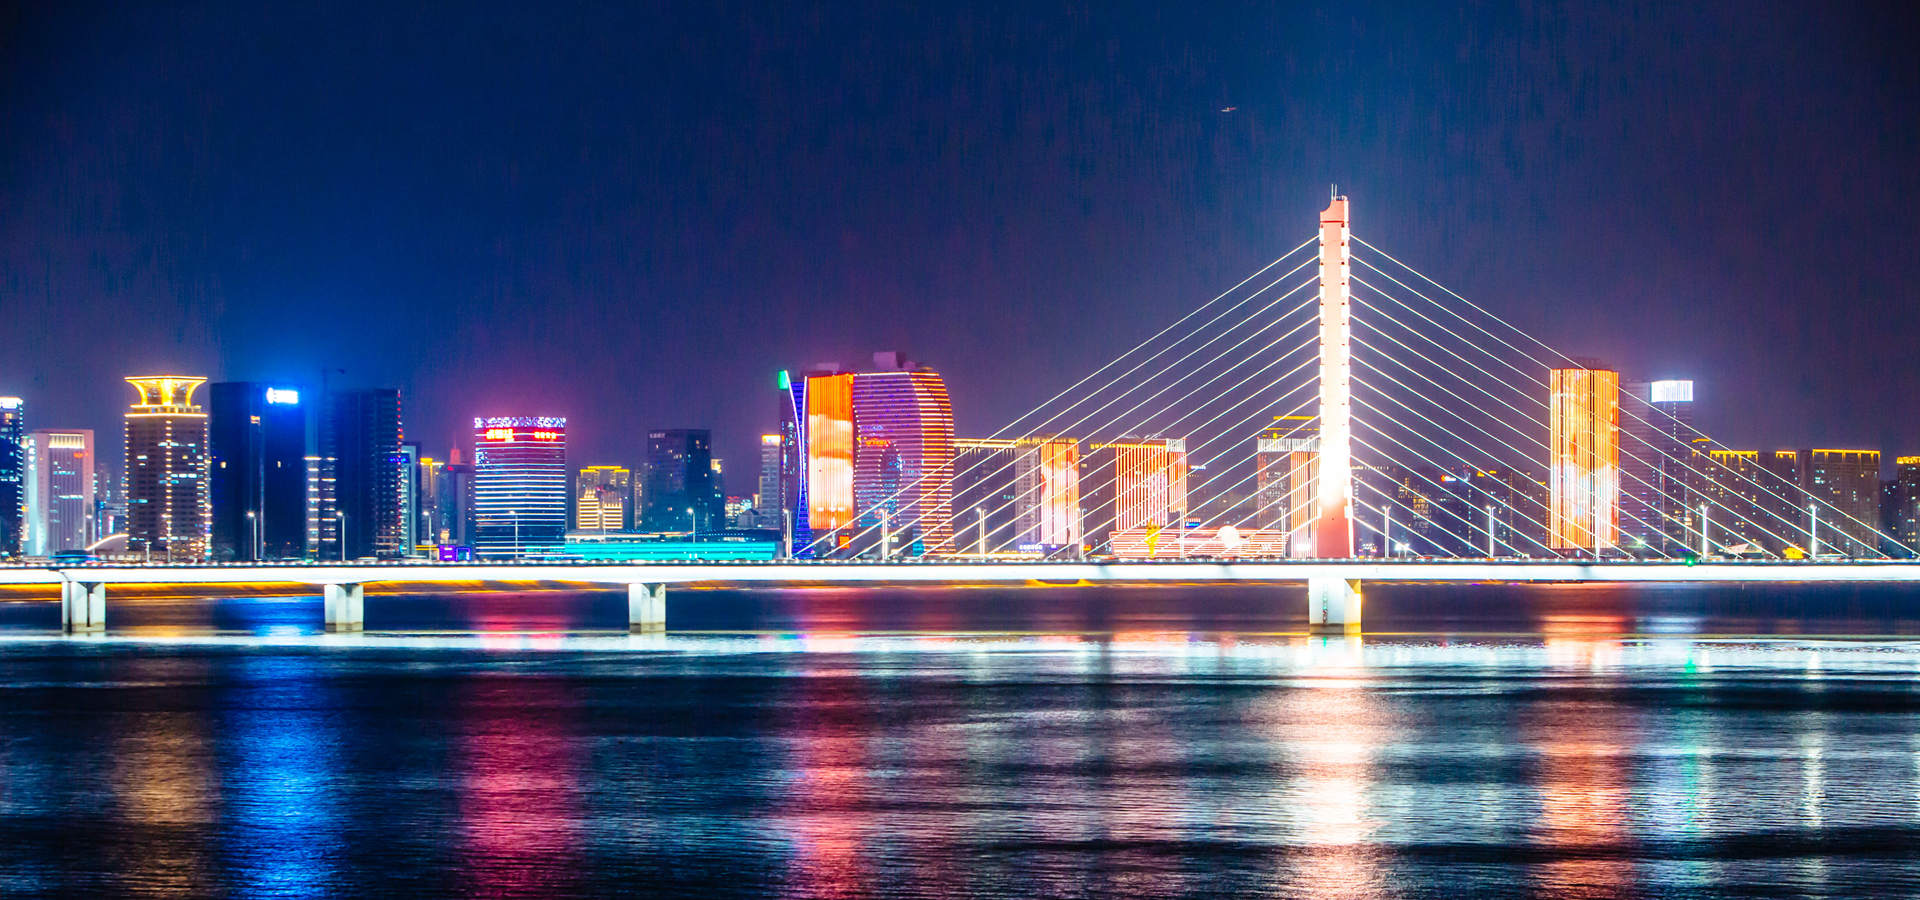 【聚焦G20】杭州的橋